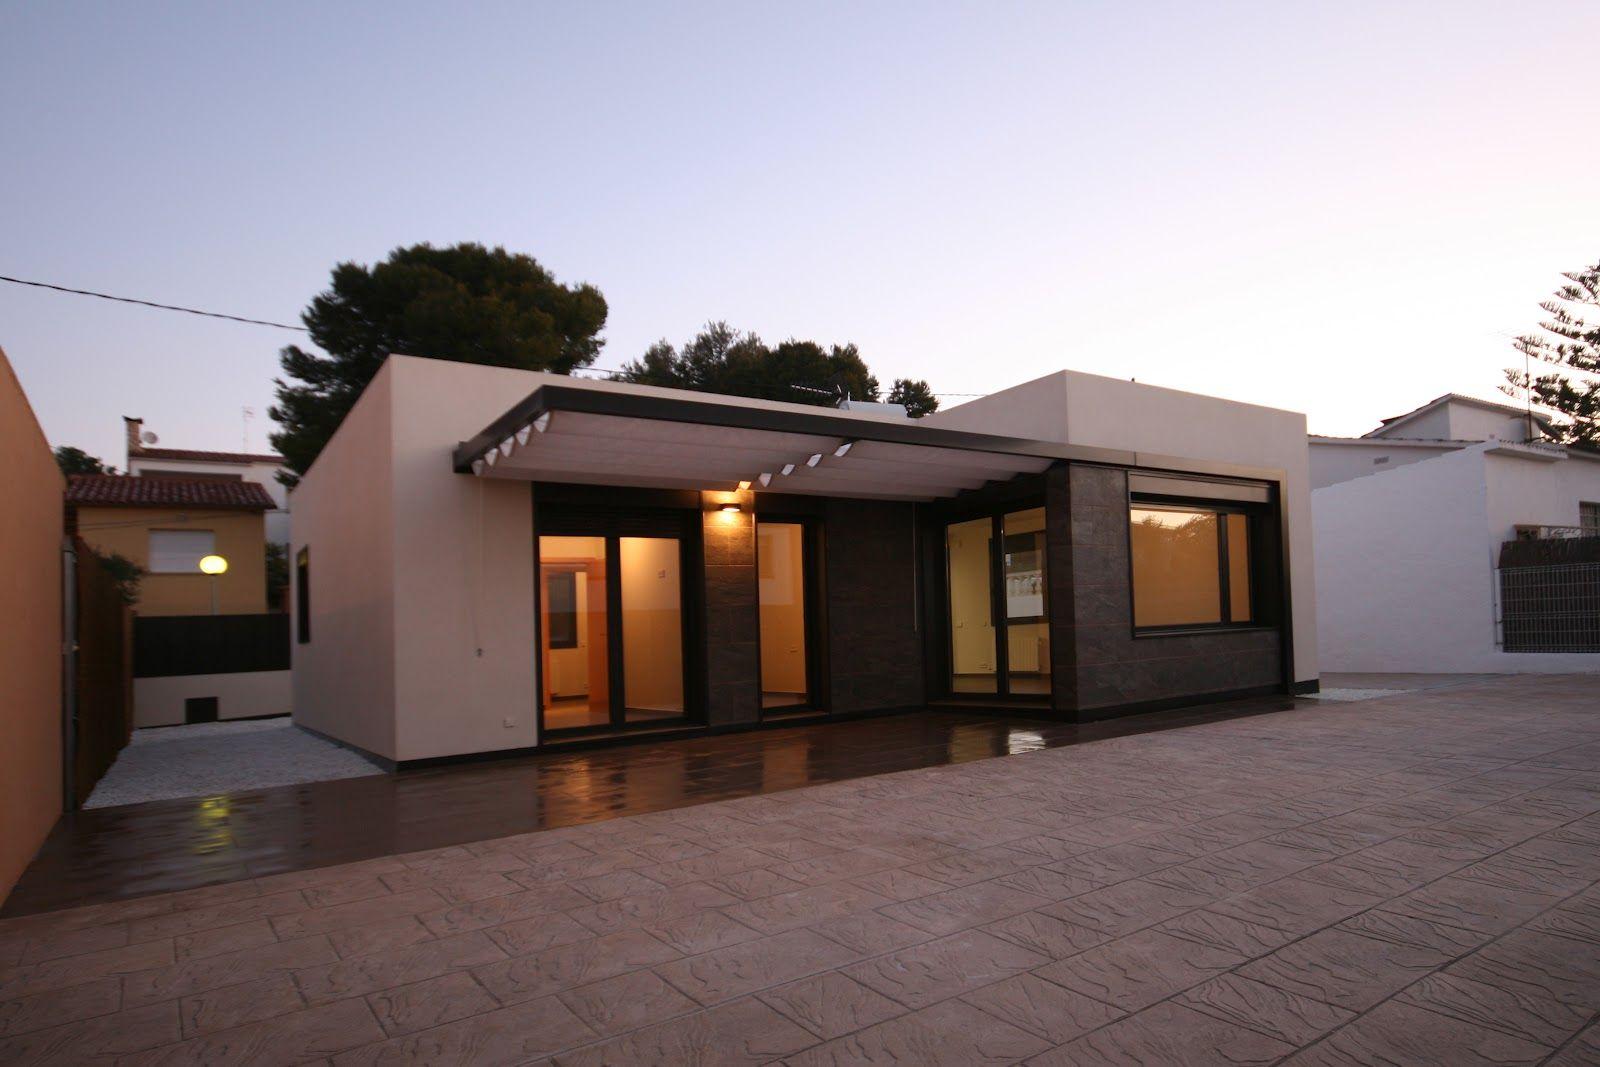 Precios viviendas modulares hormigon | sweet home | Pinterest ...